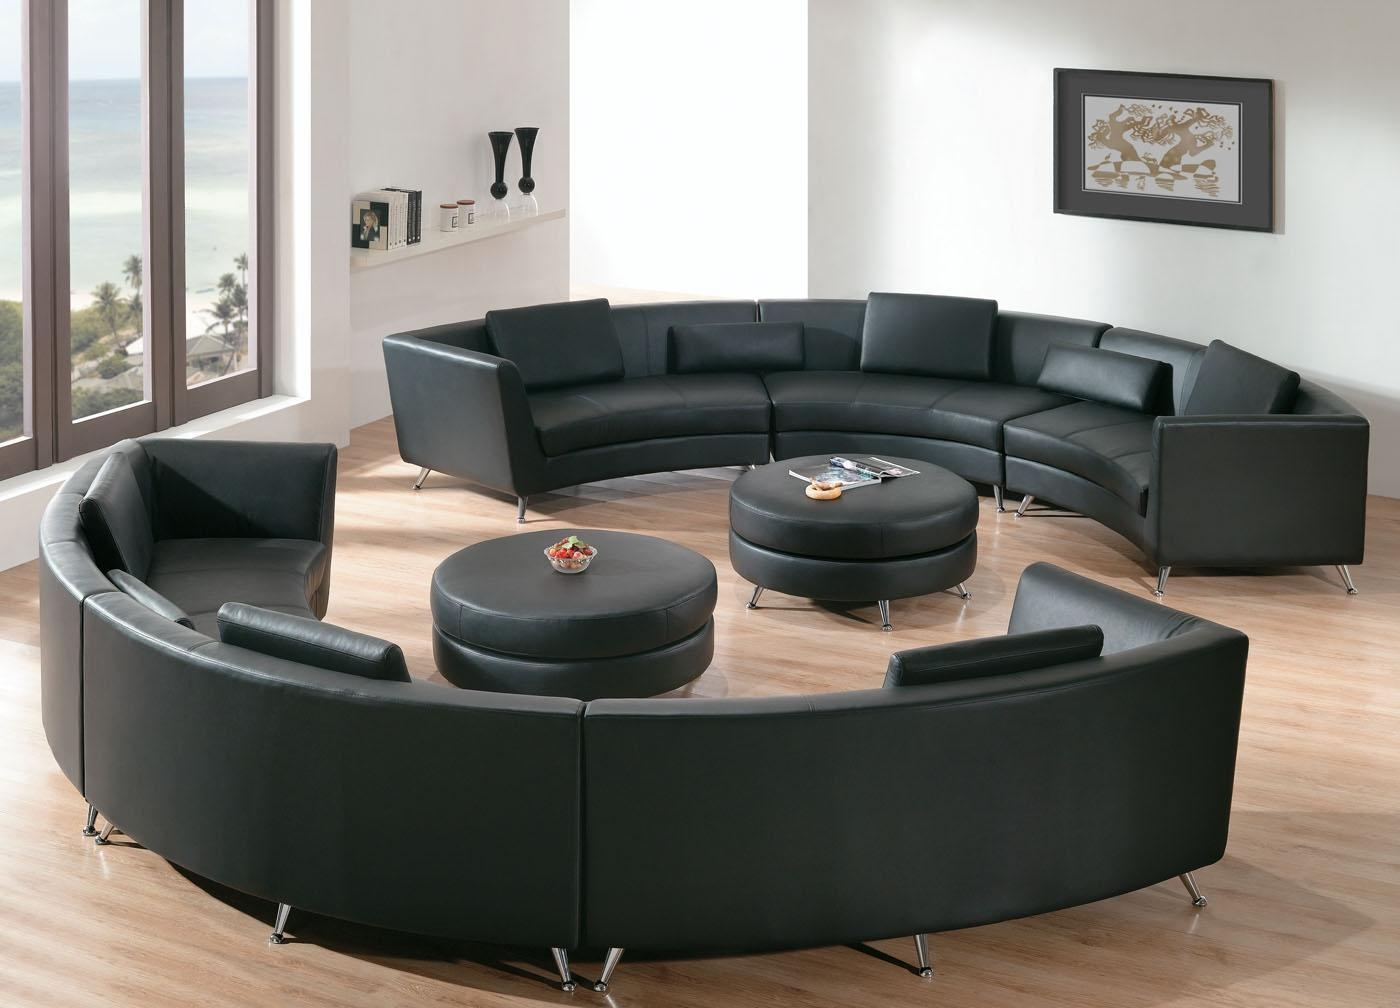 Sofas Center : Sofas Center Roundl Sofa Rare Photos Ideas Semi In Semi Sofas (Image 18 of 20)